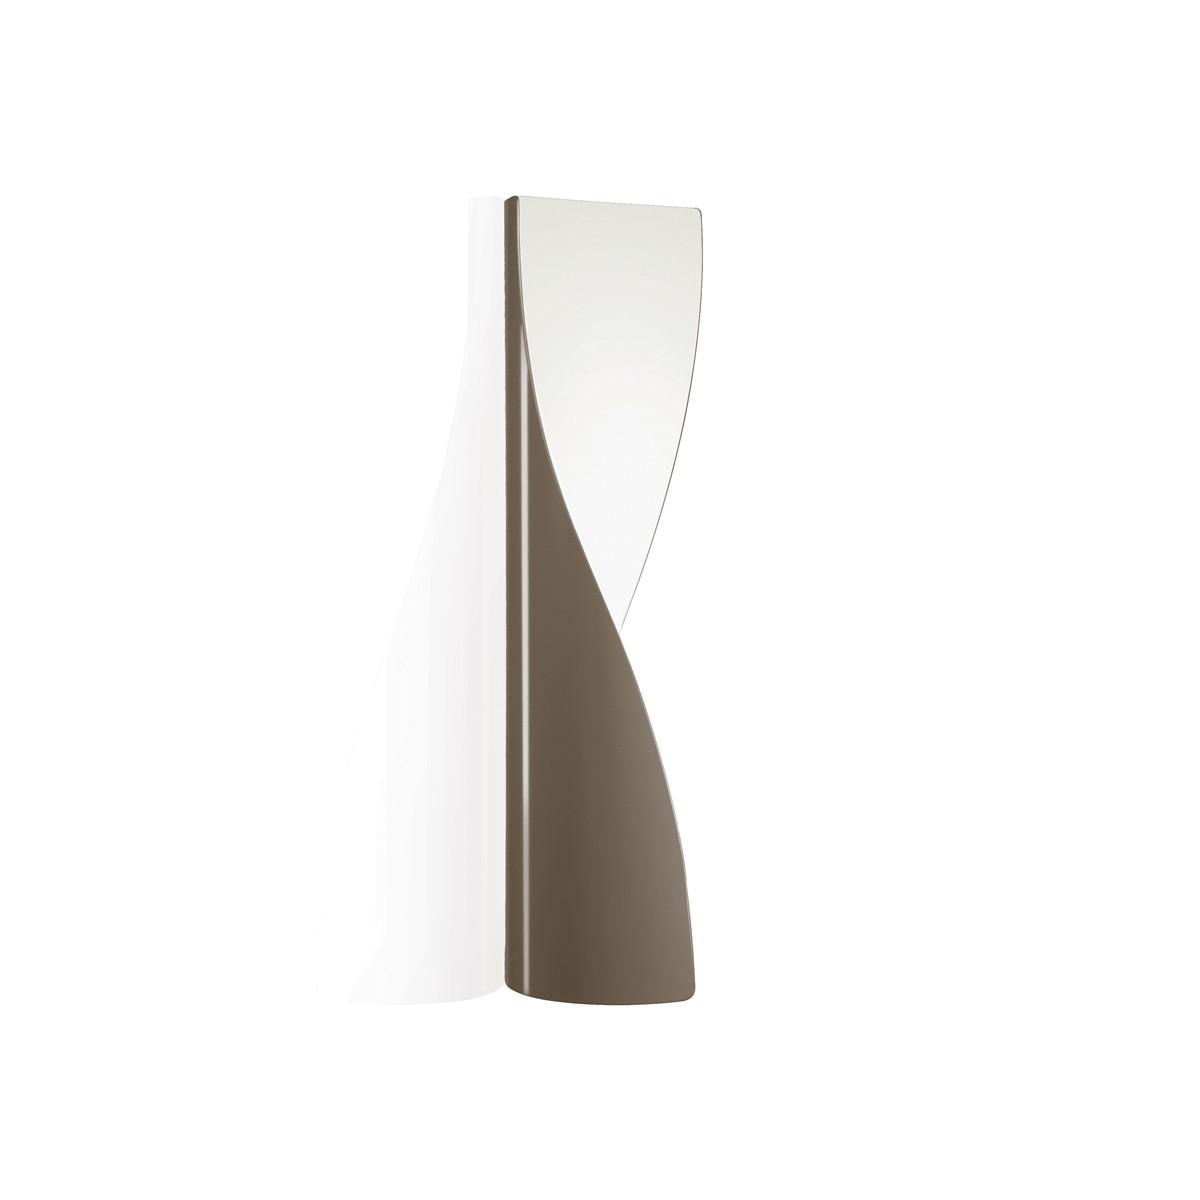 Kundalini Evita LED Wandleuchte, taubengrau glänzend